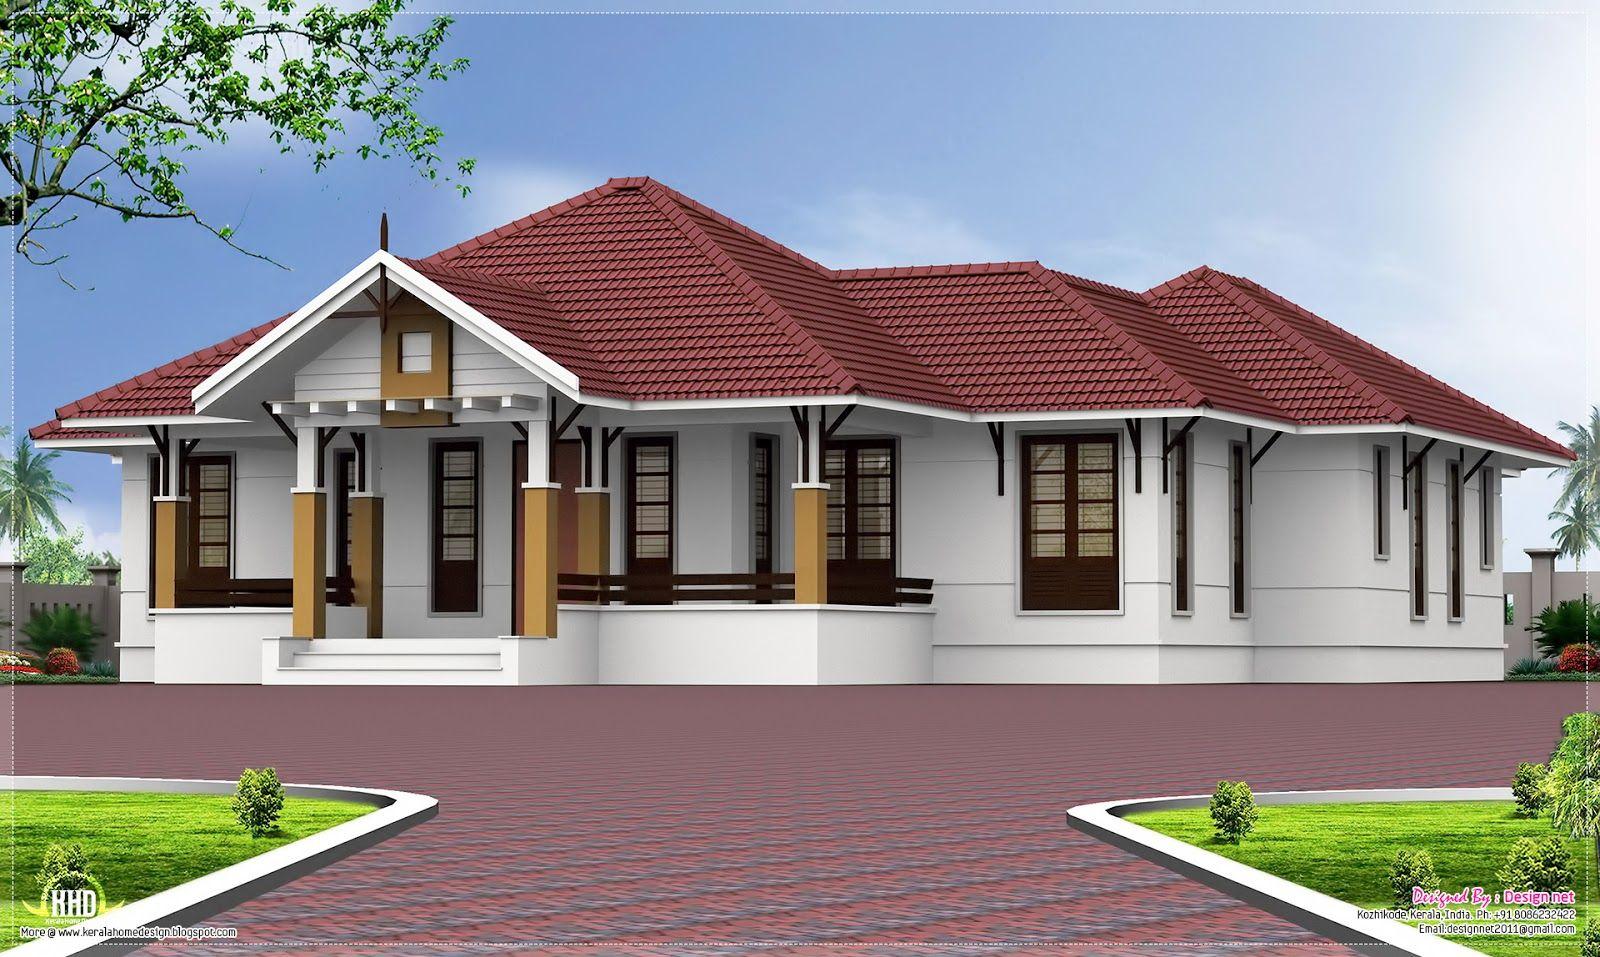 1676 sqft 3 bhk single floor low cost kerala home design house